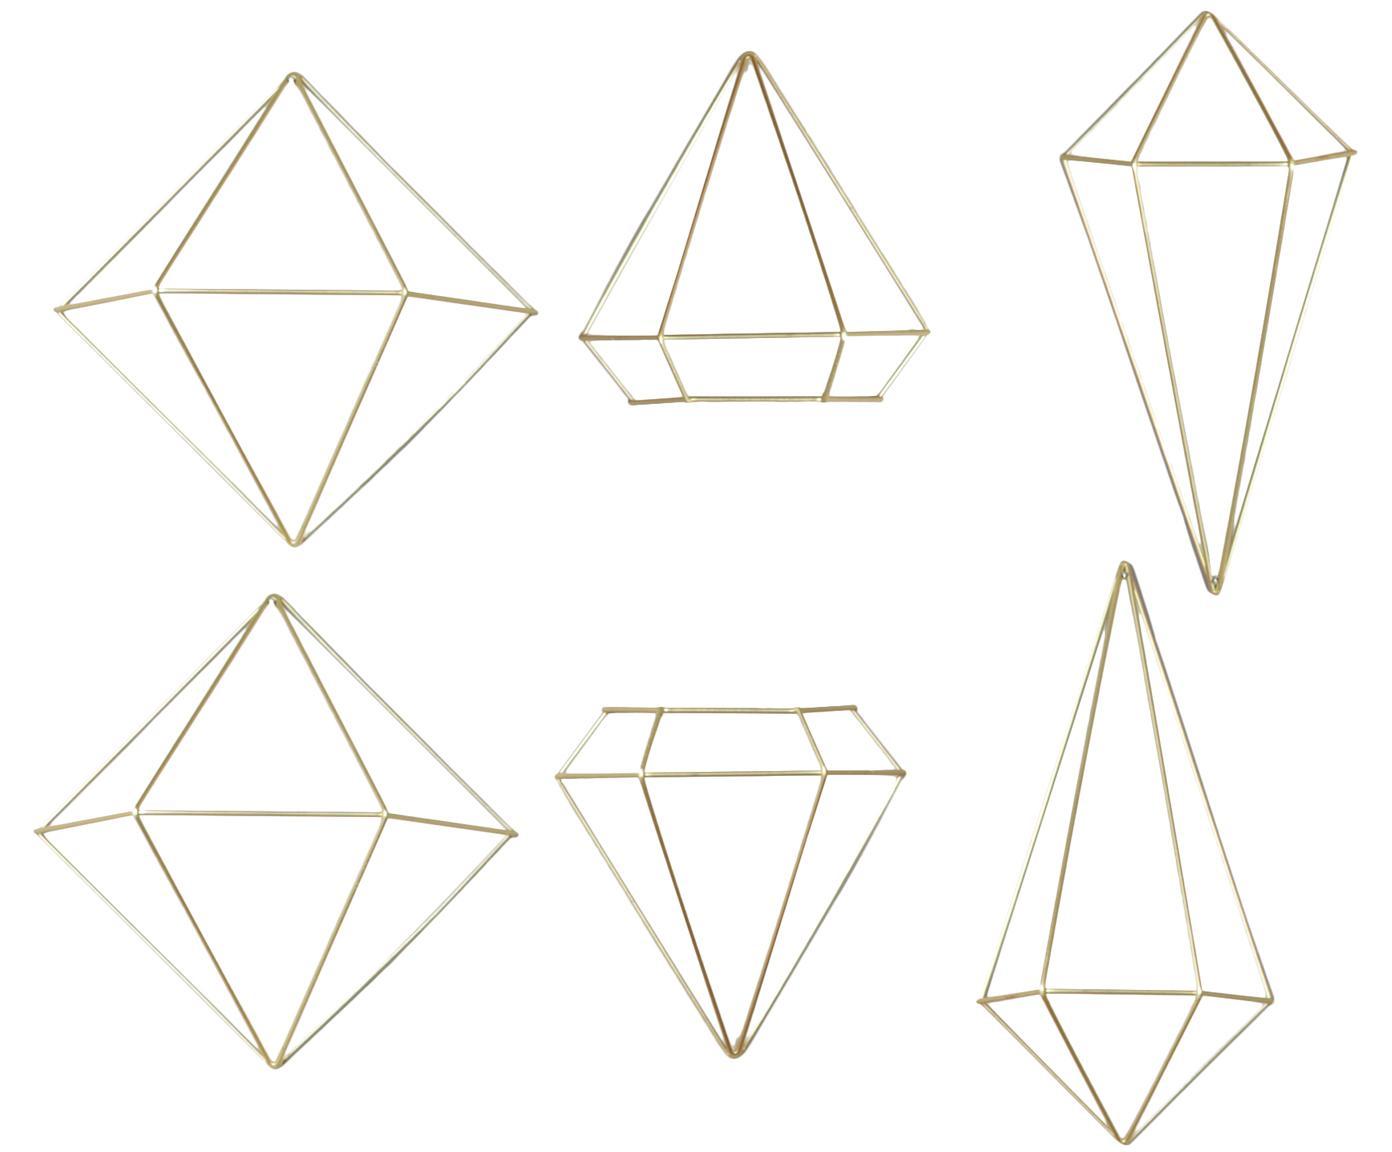 Wandobjekte-Set Prisma aus lackiertem Metall, 6-tlg., Metall, lackiert, Messingfarben, Sondergrößen